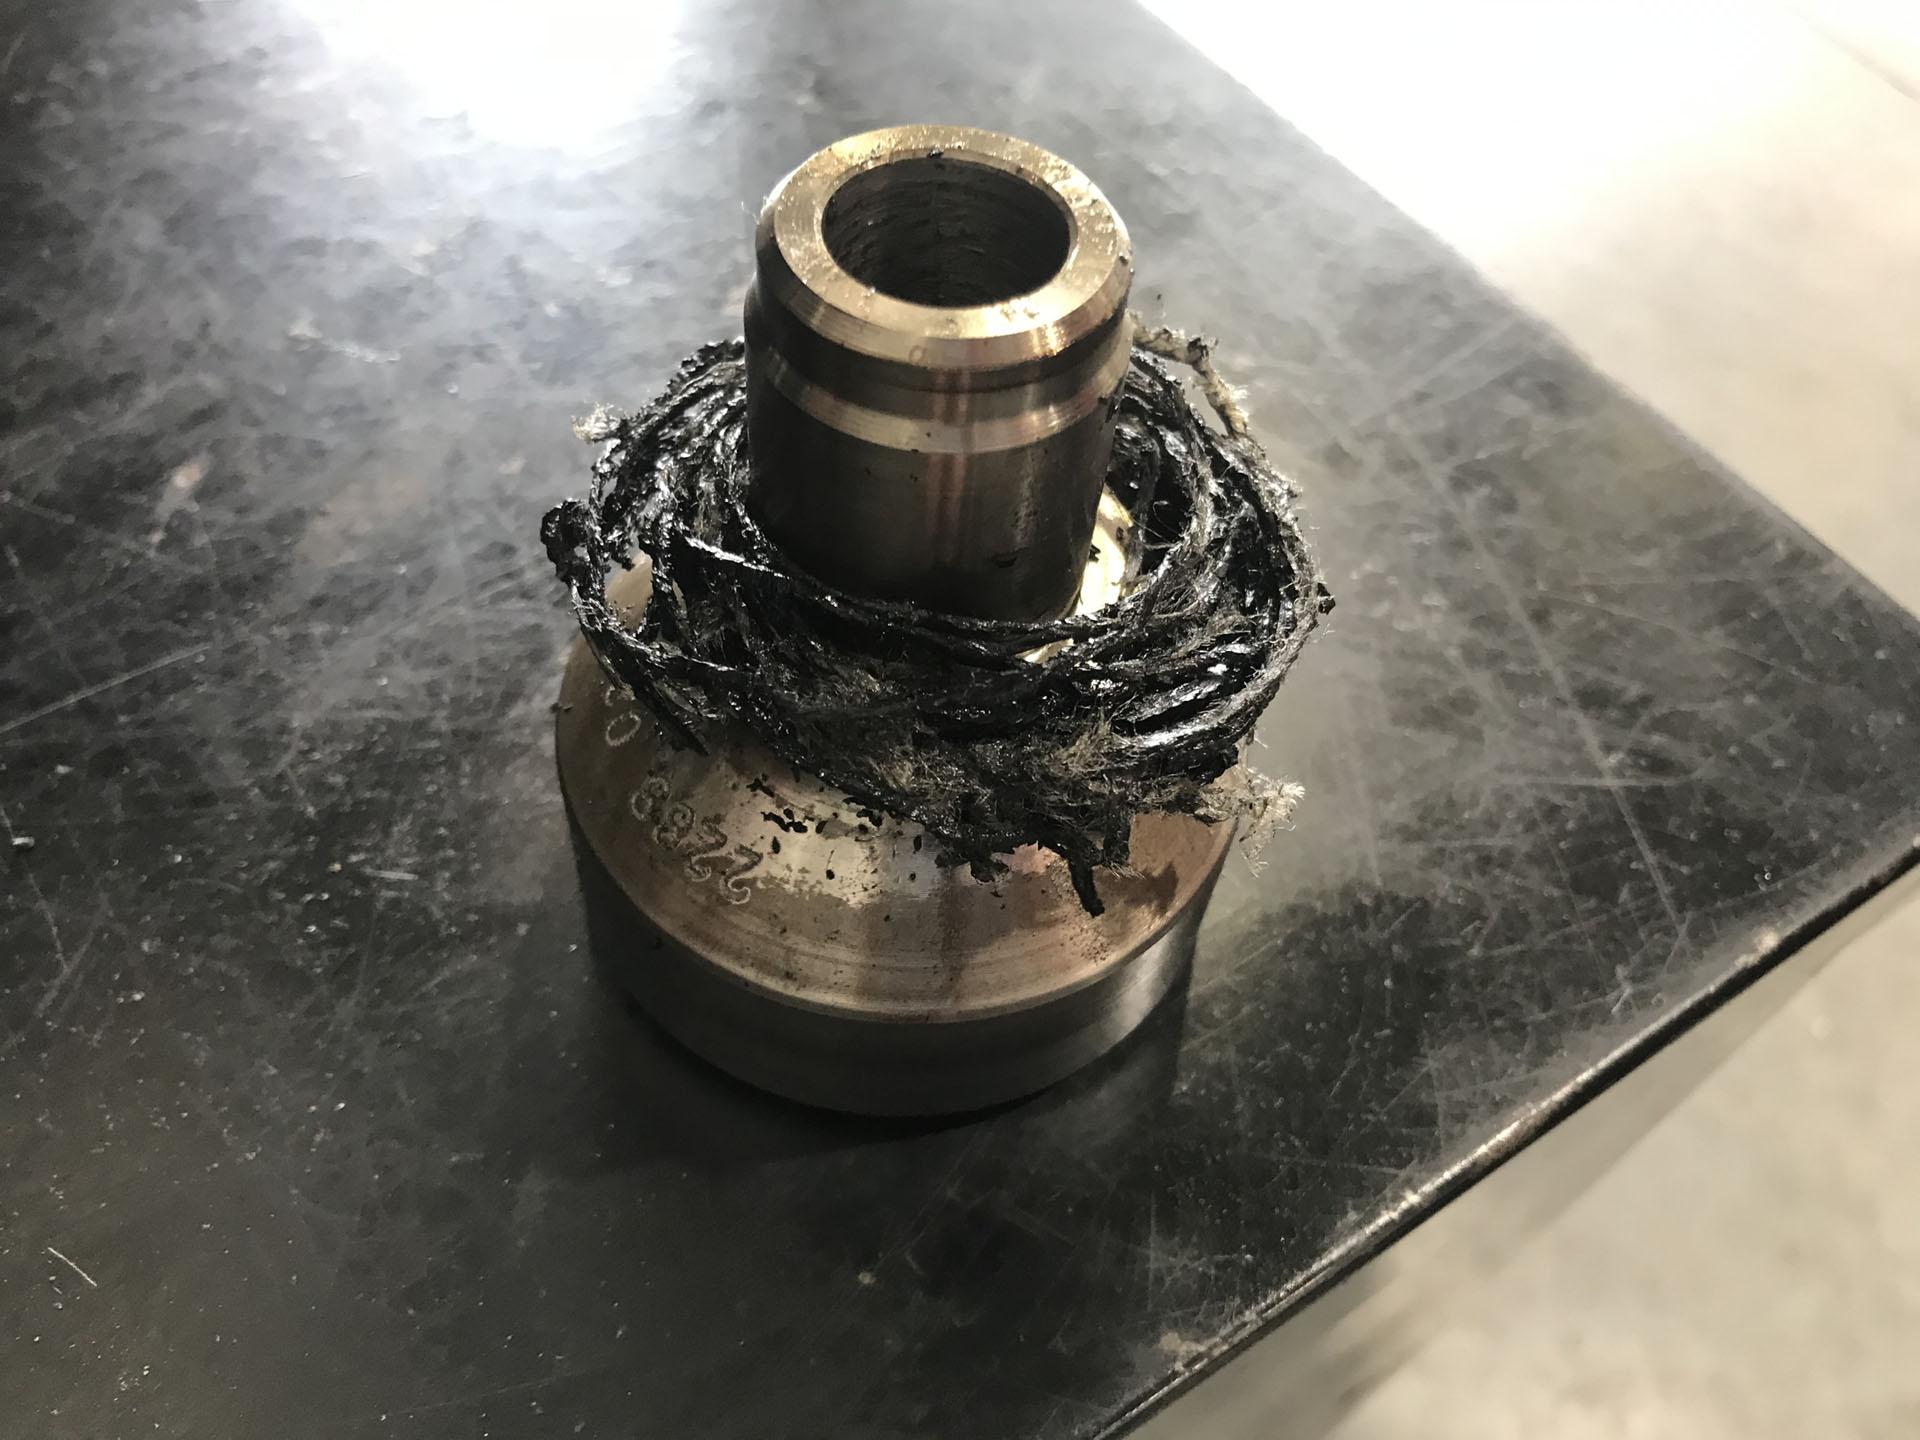 Serpentine belt caught in engine stops BMW from running